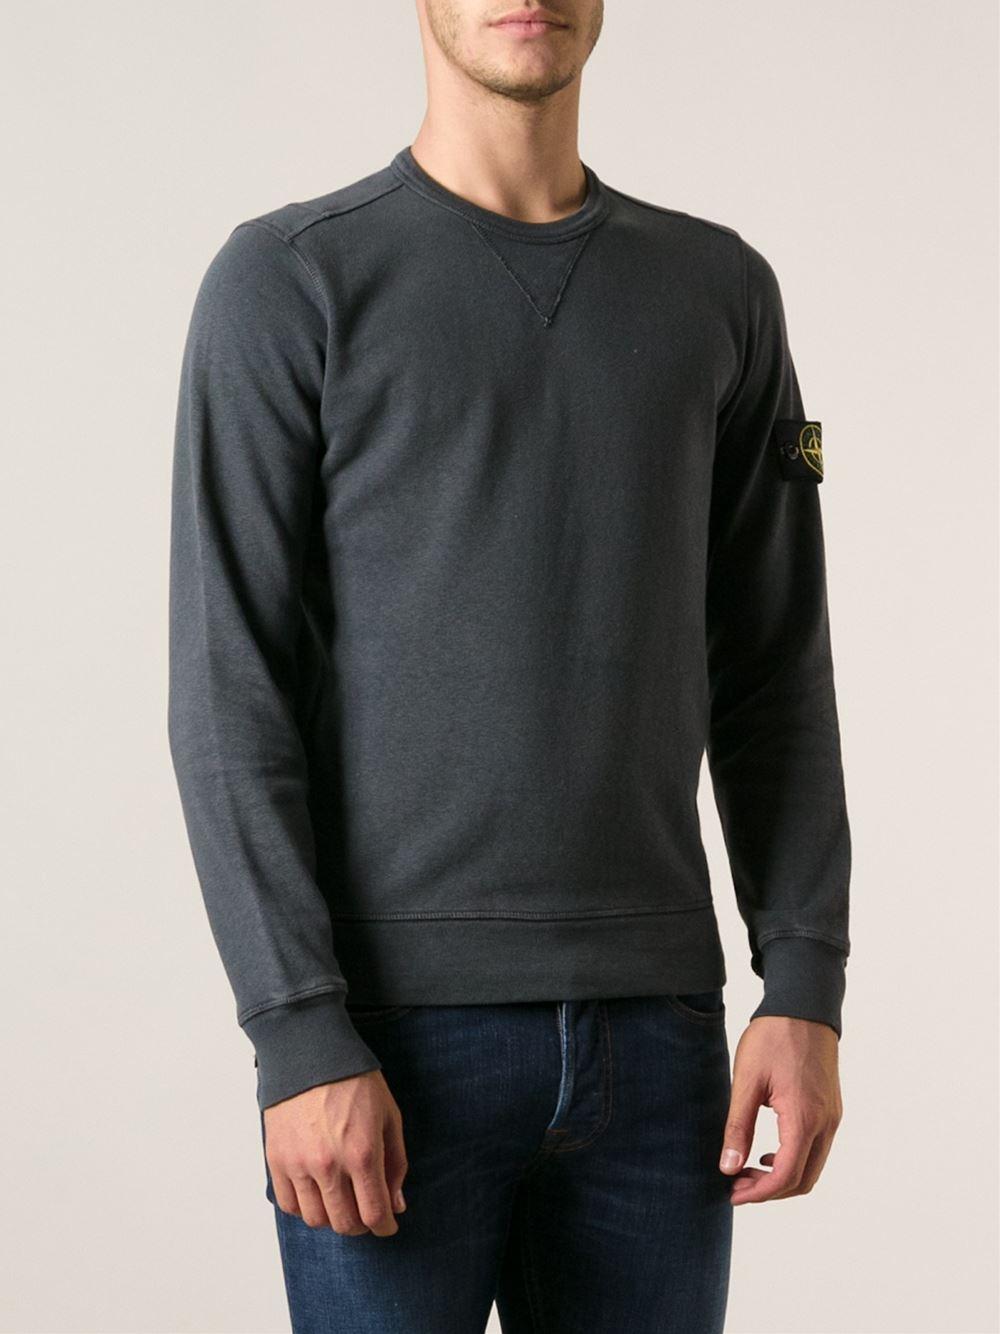 08effc3663e8 Stone Island Grey Crew Neck Sweatshirt